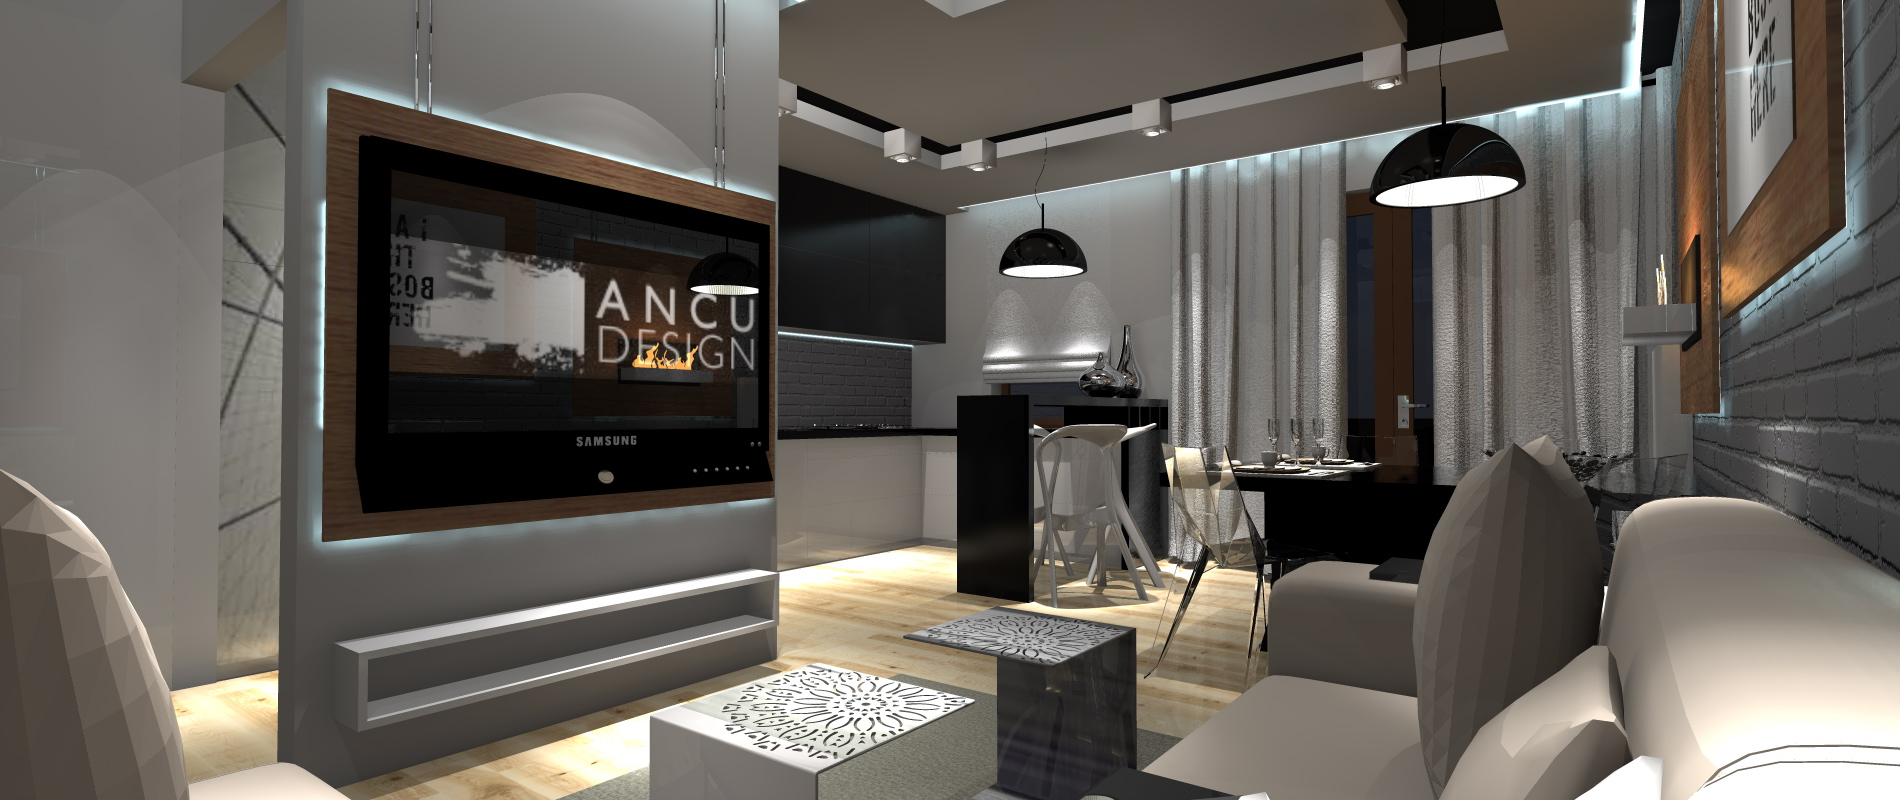 Projekt Salonu Z Aneksem Kuchennym Portfolio Ancu Design